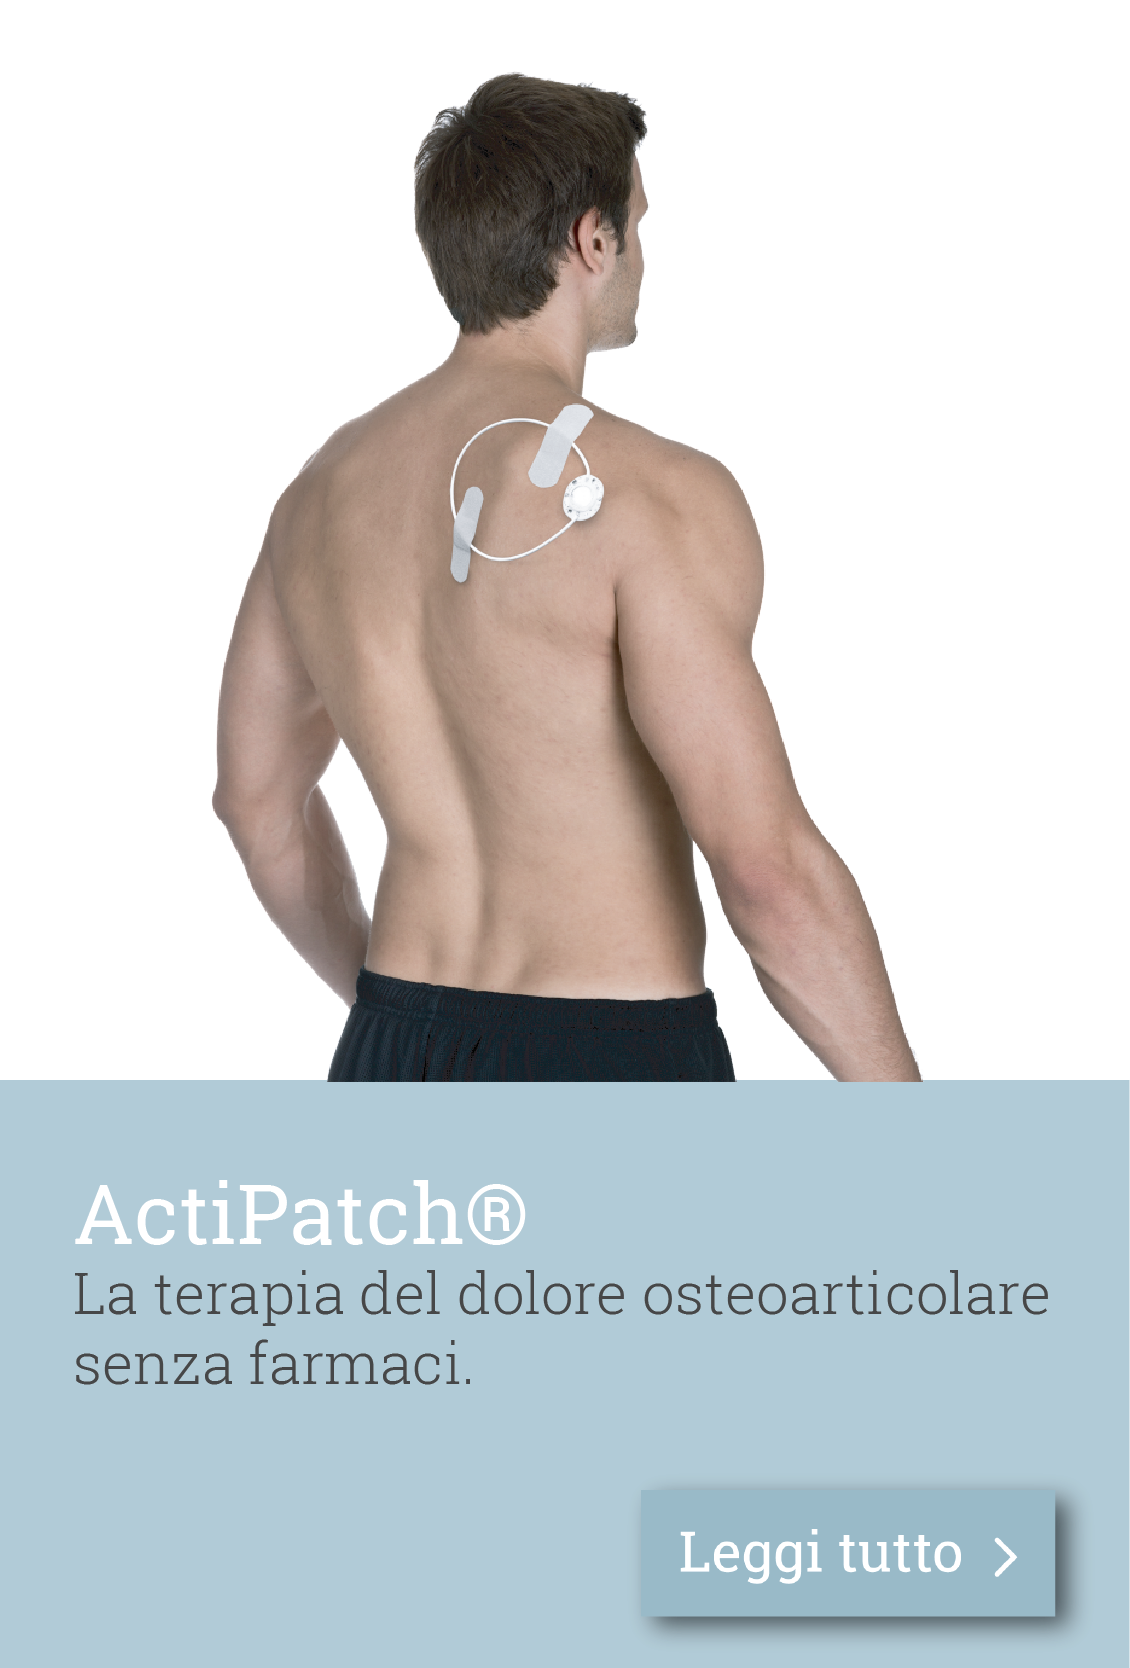 ActiPatch®